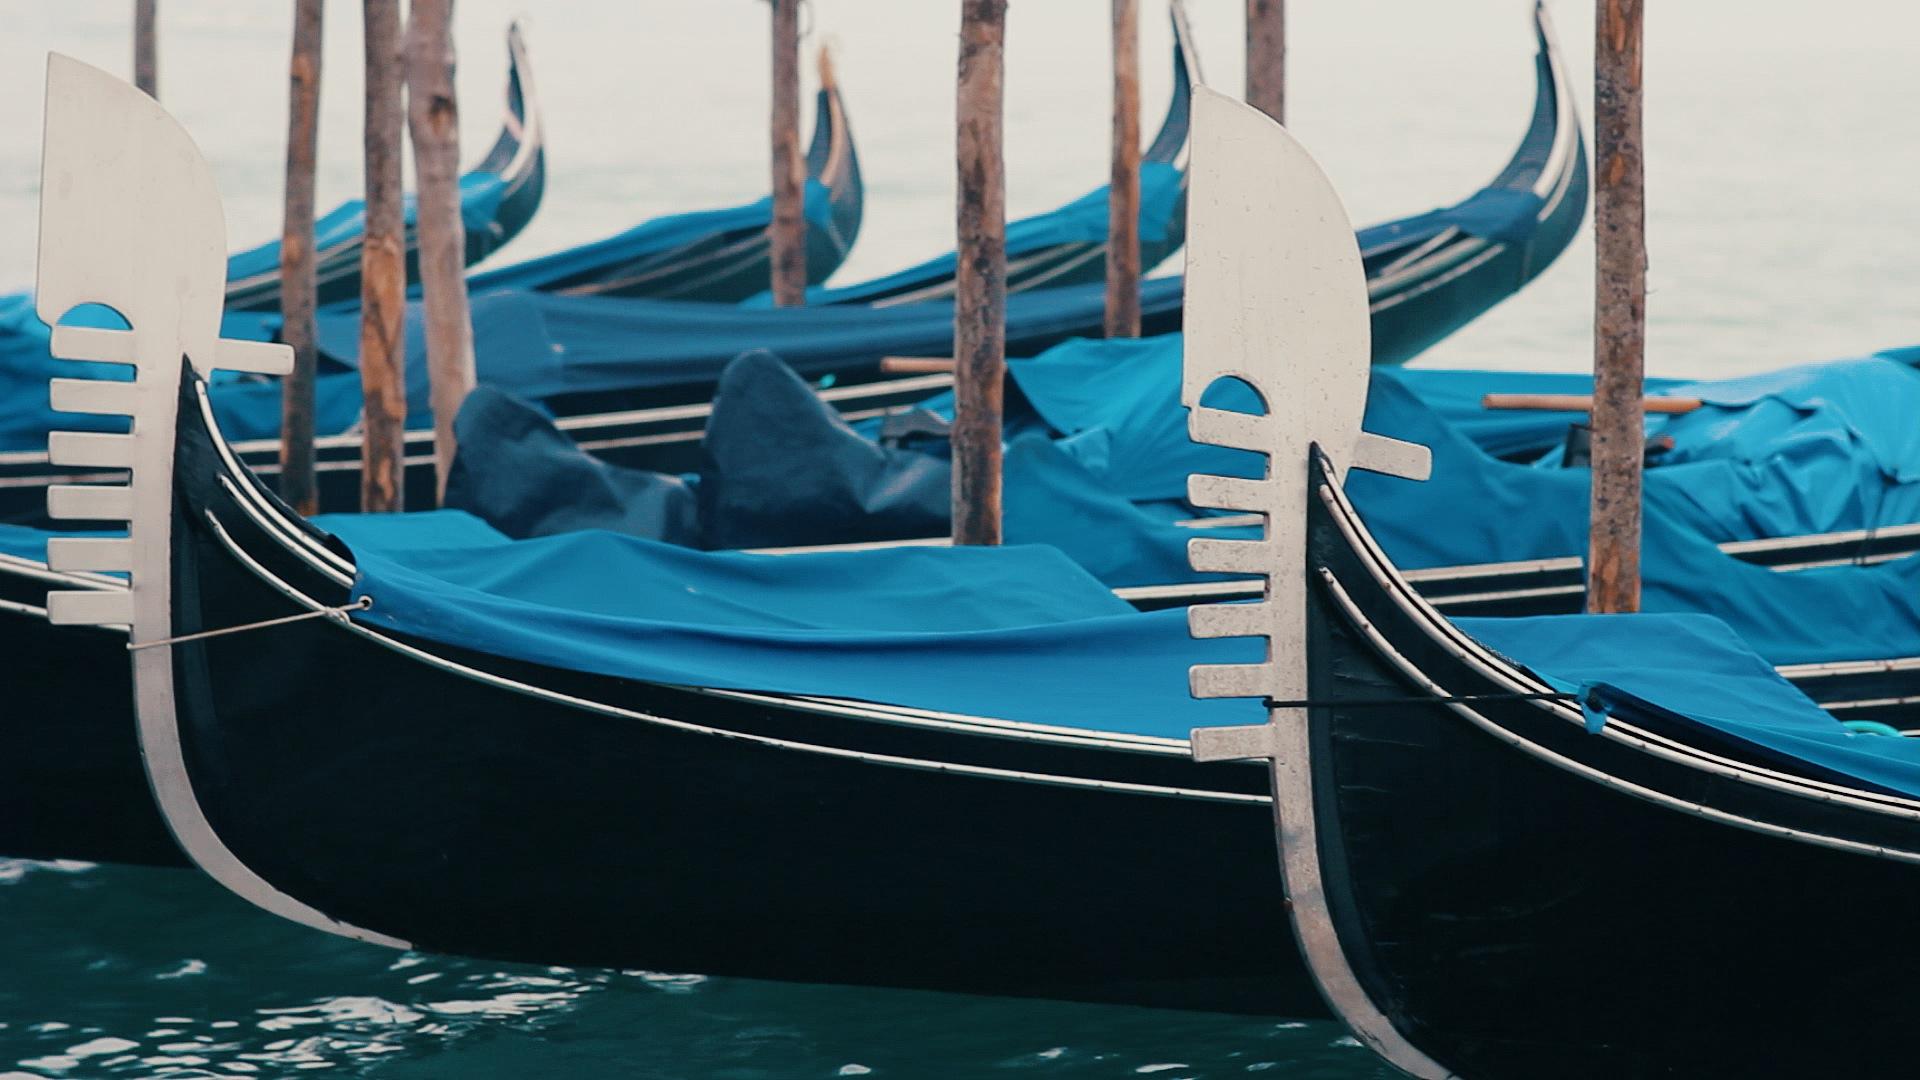 ff venezia 01